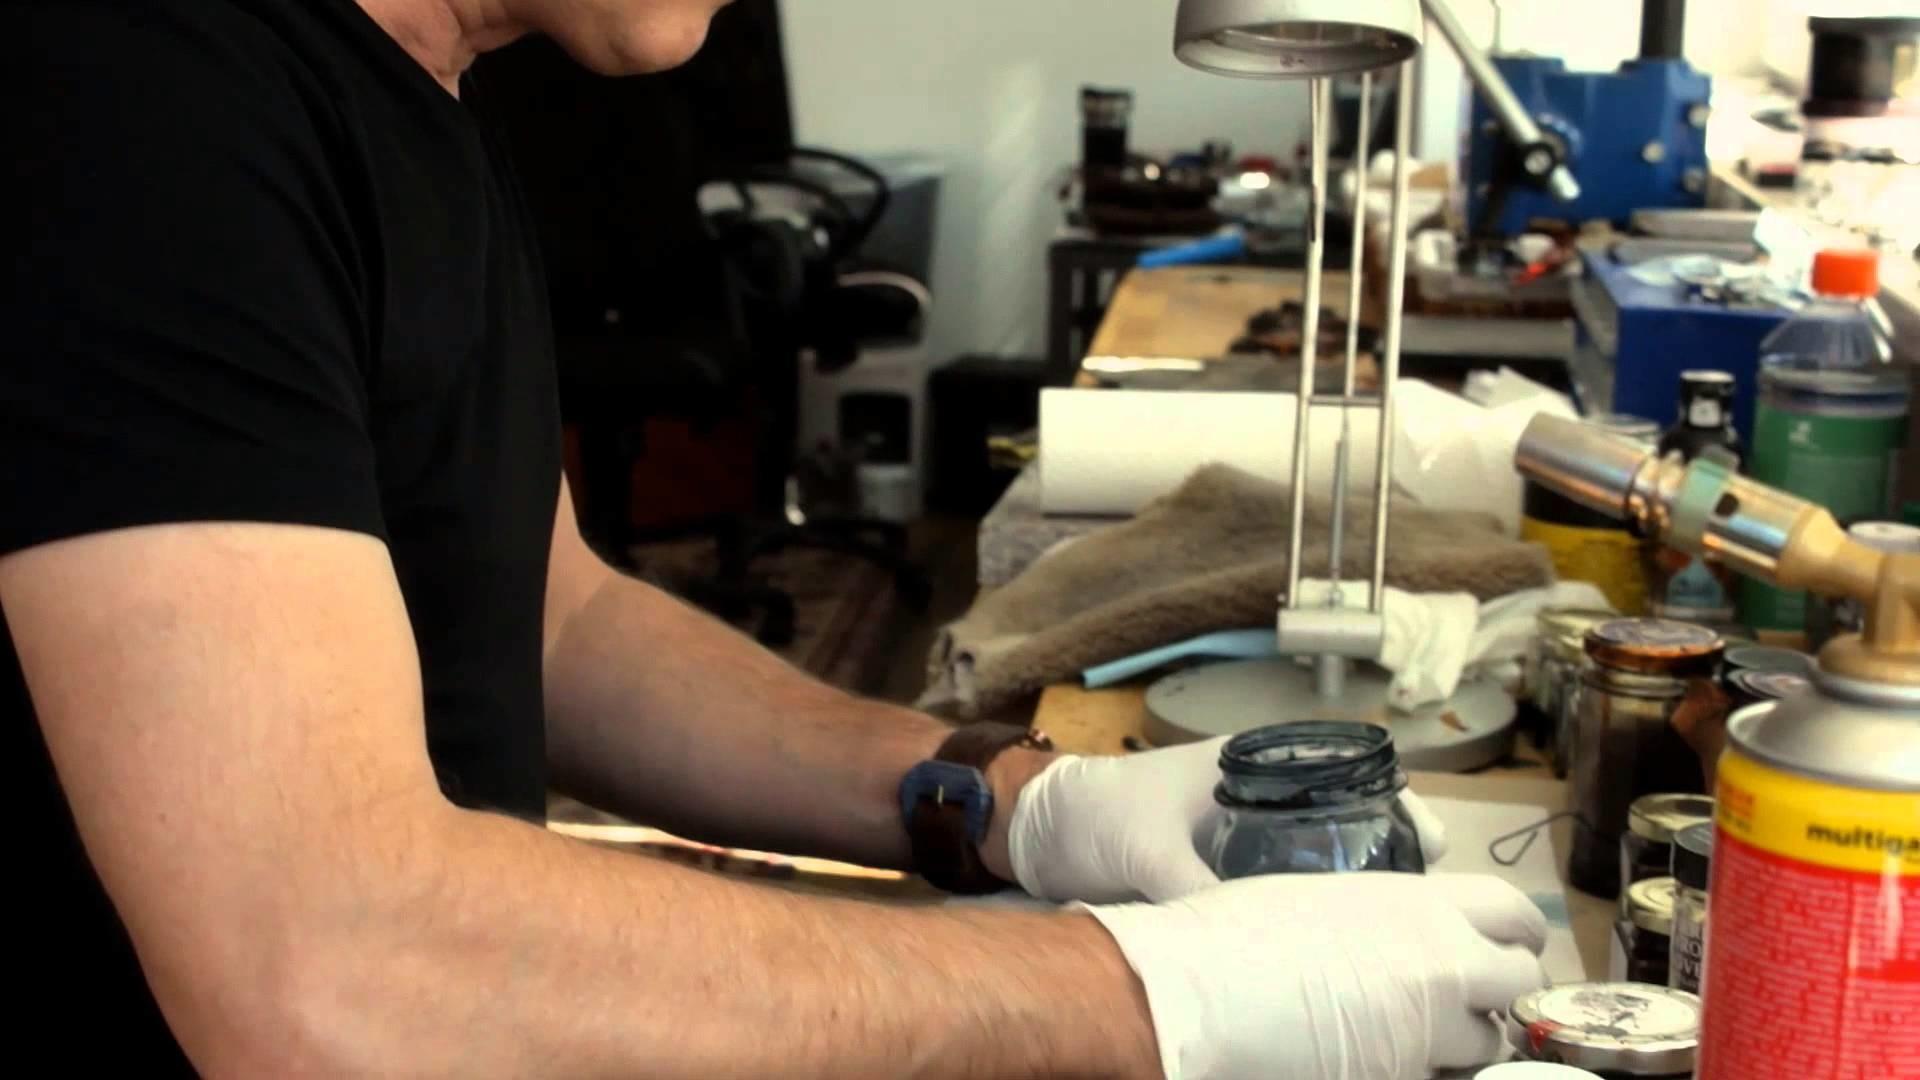 Dangerous9straps - Making of a Fine Handmade Watch Strap